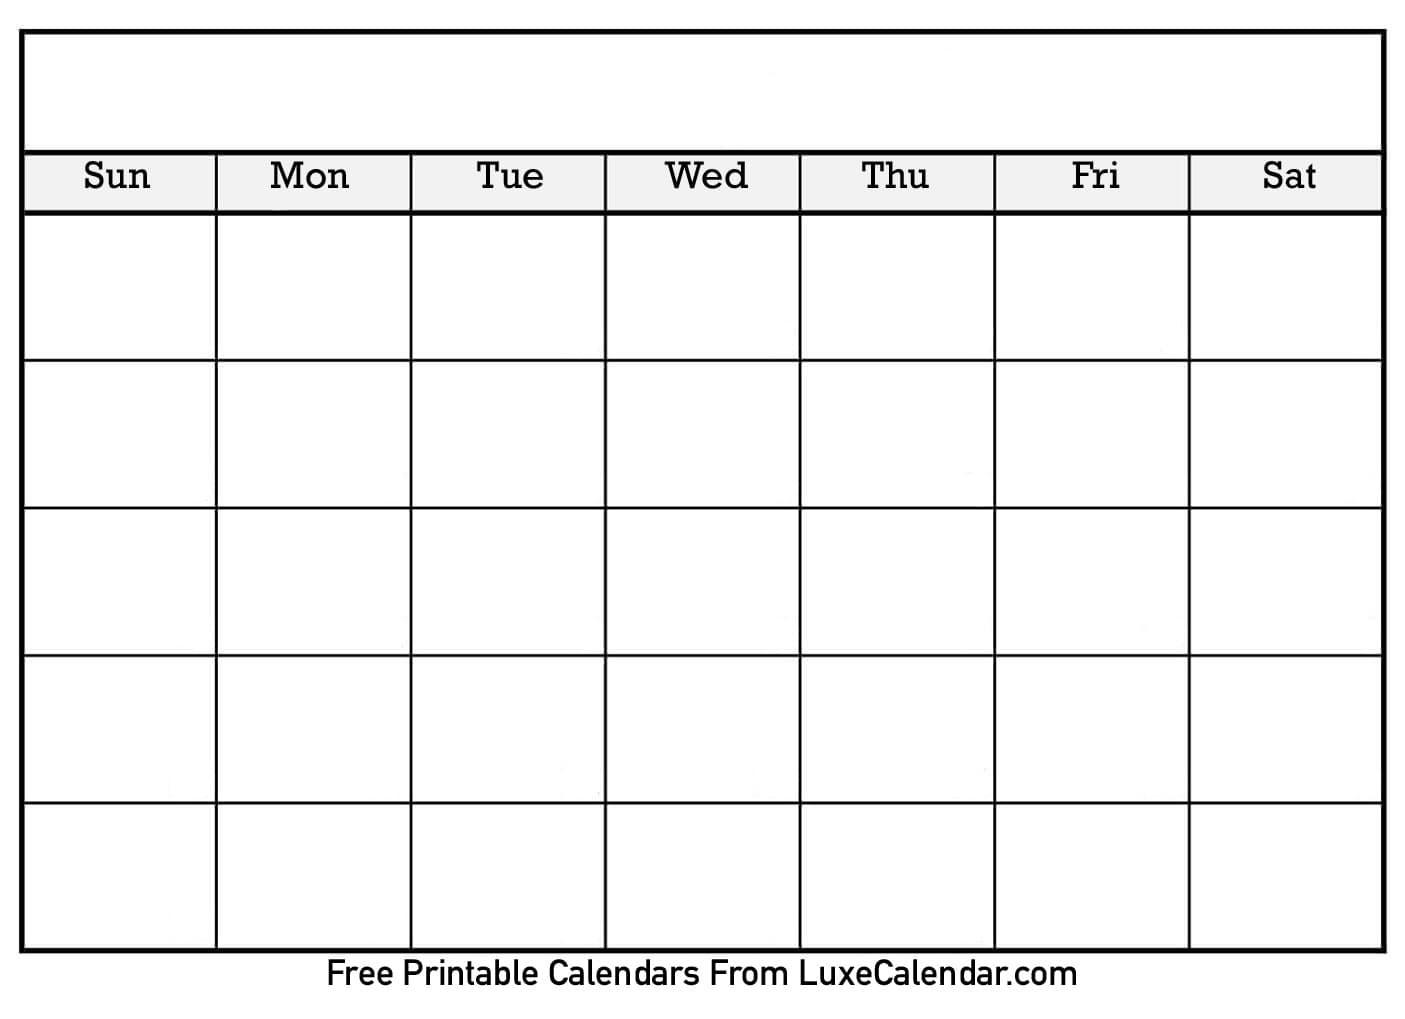 Blank Printable Calendar - Luxe Calendar  Printable Full Page Monthly Calendar Blank